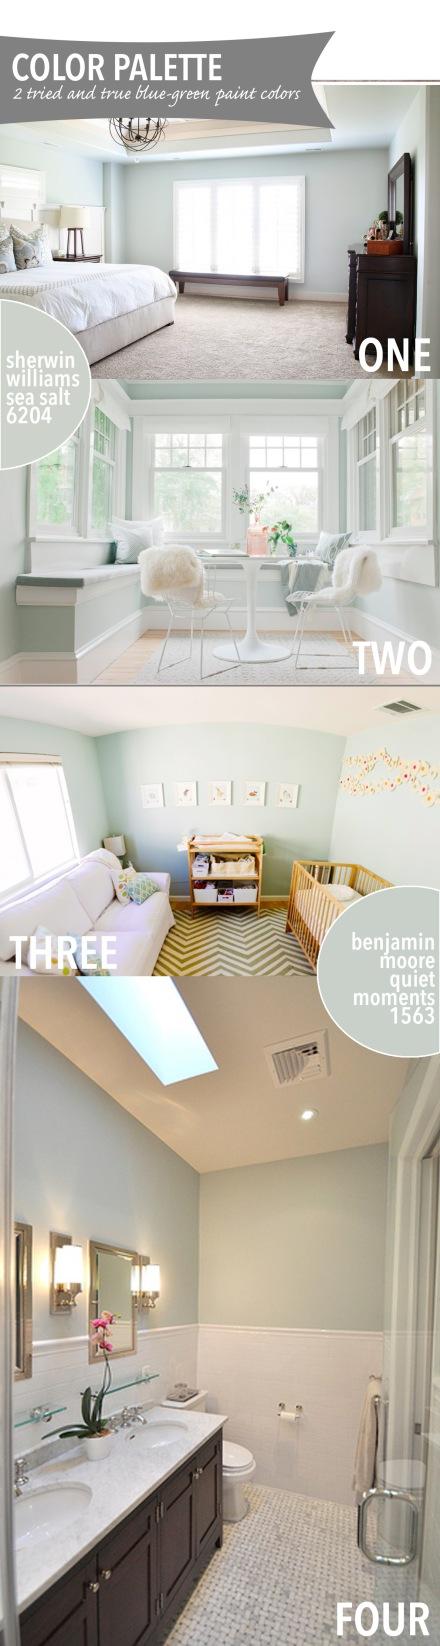 The Best Blue-Green Paint Colors   www.theanatomyofdesign.com